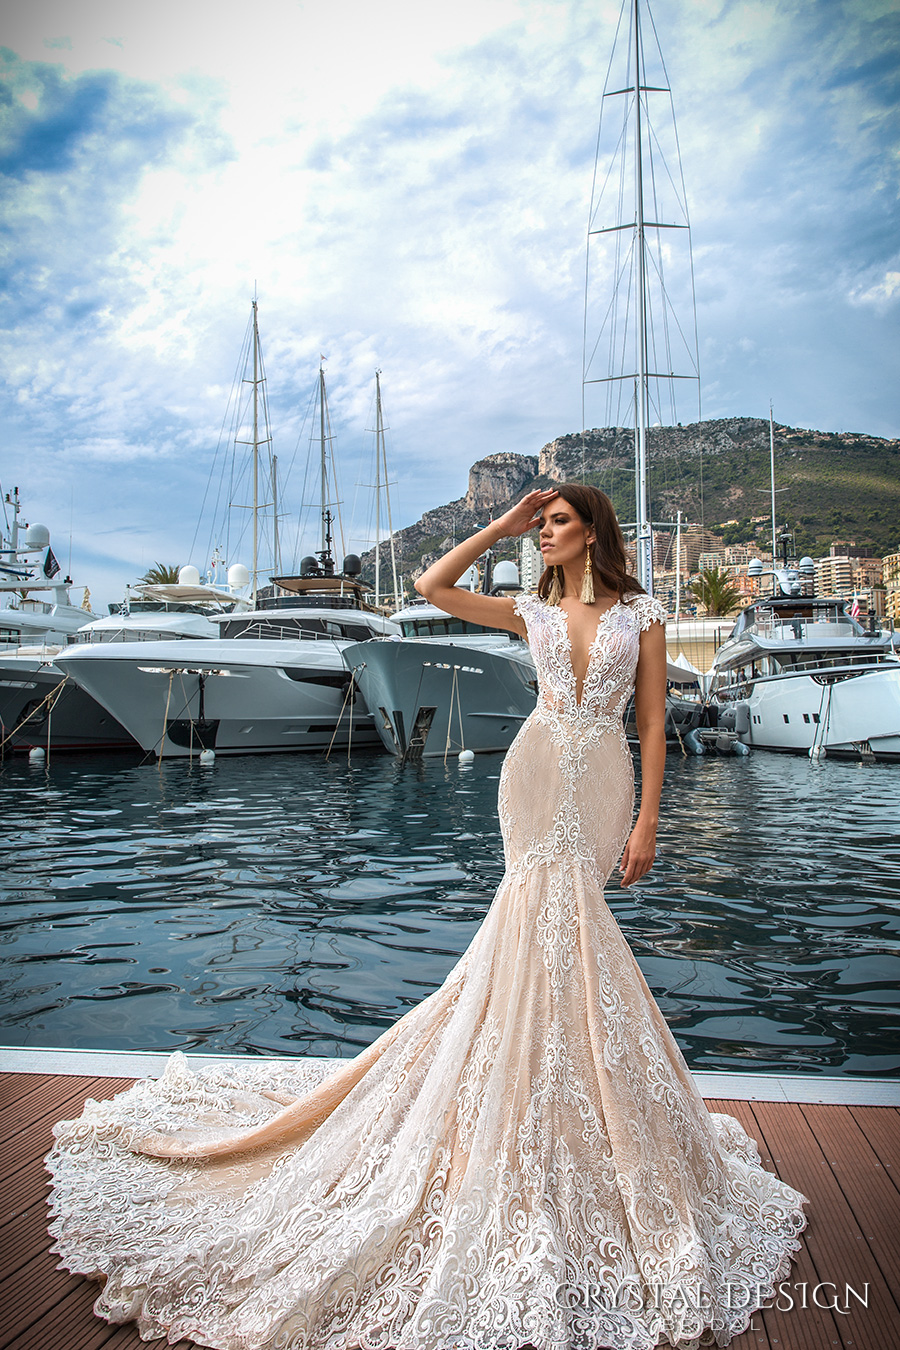 crystal design 2017 bridal cap sleeves deep plunging v neck full embellishment ivory color sexy elegant fit and flare mermaid wedding dress low back royal long train (marchesa) mv